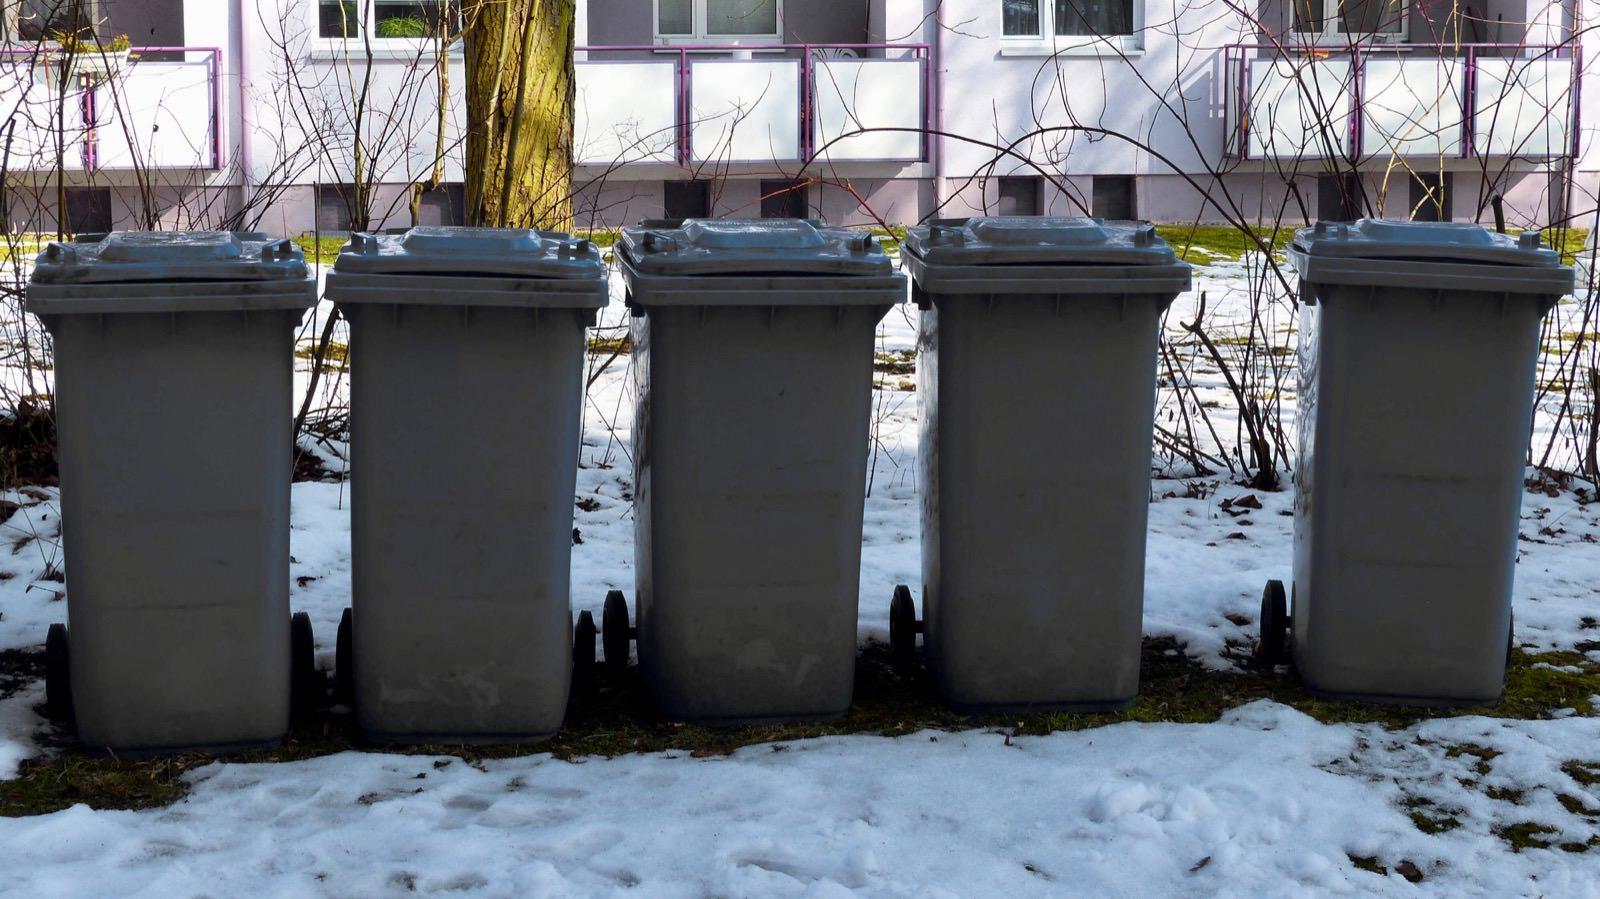 Abfalltonnen im Schnee (Symbolbild) | Foto: CC0 via pixabay